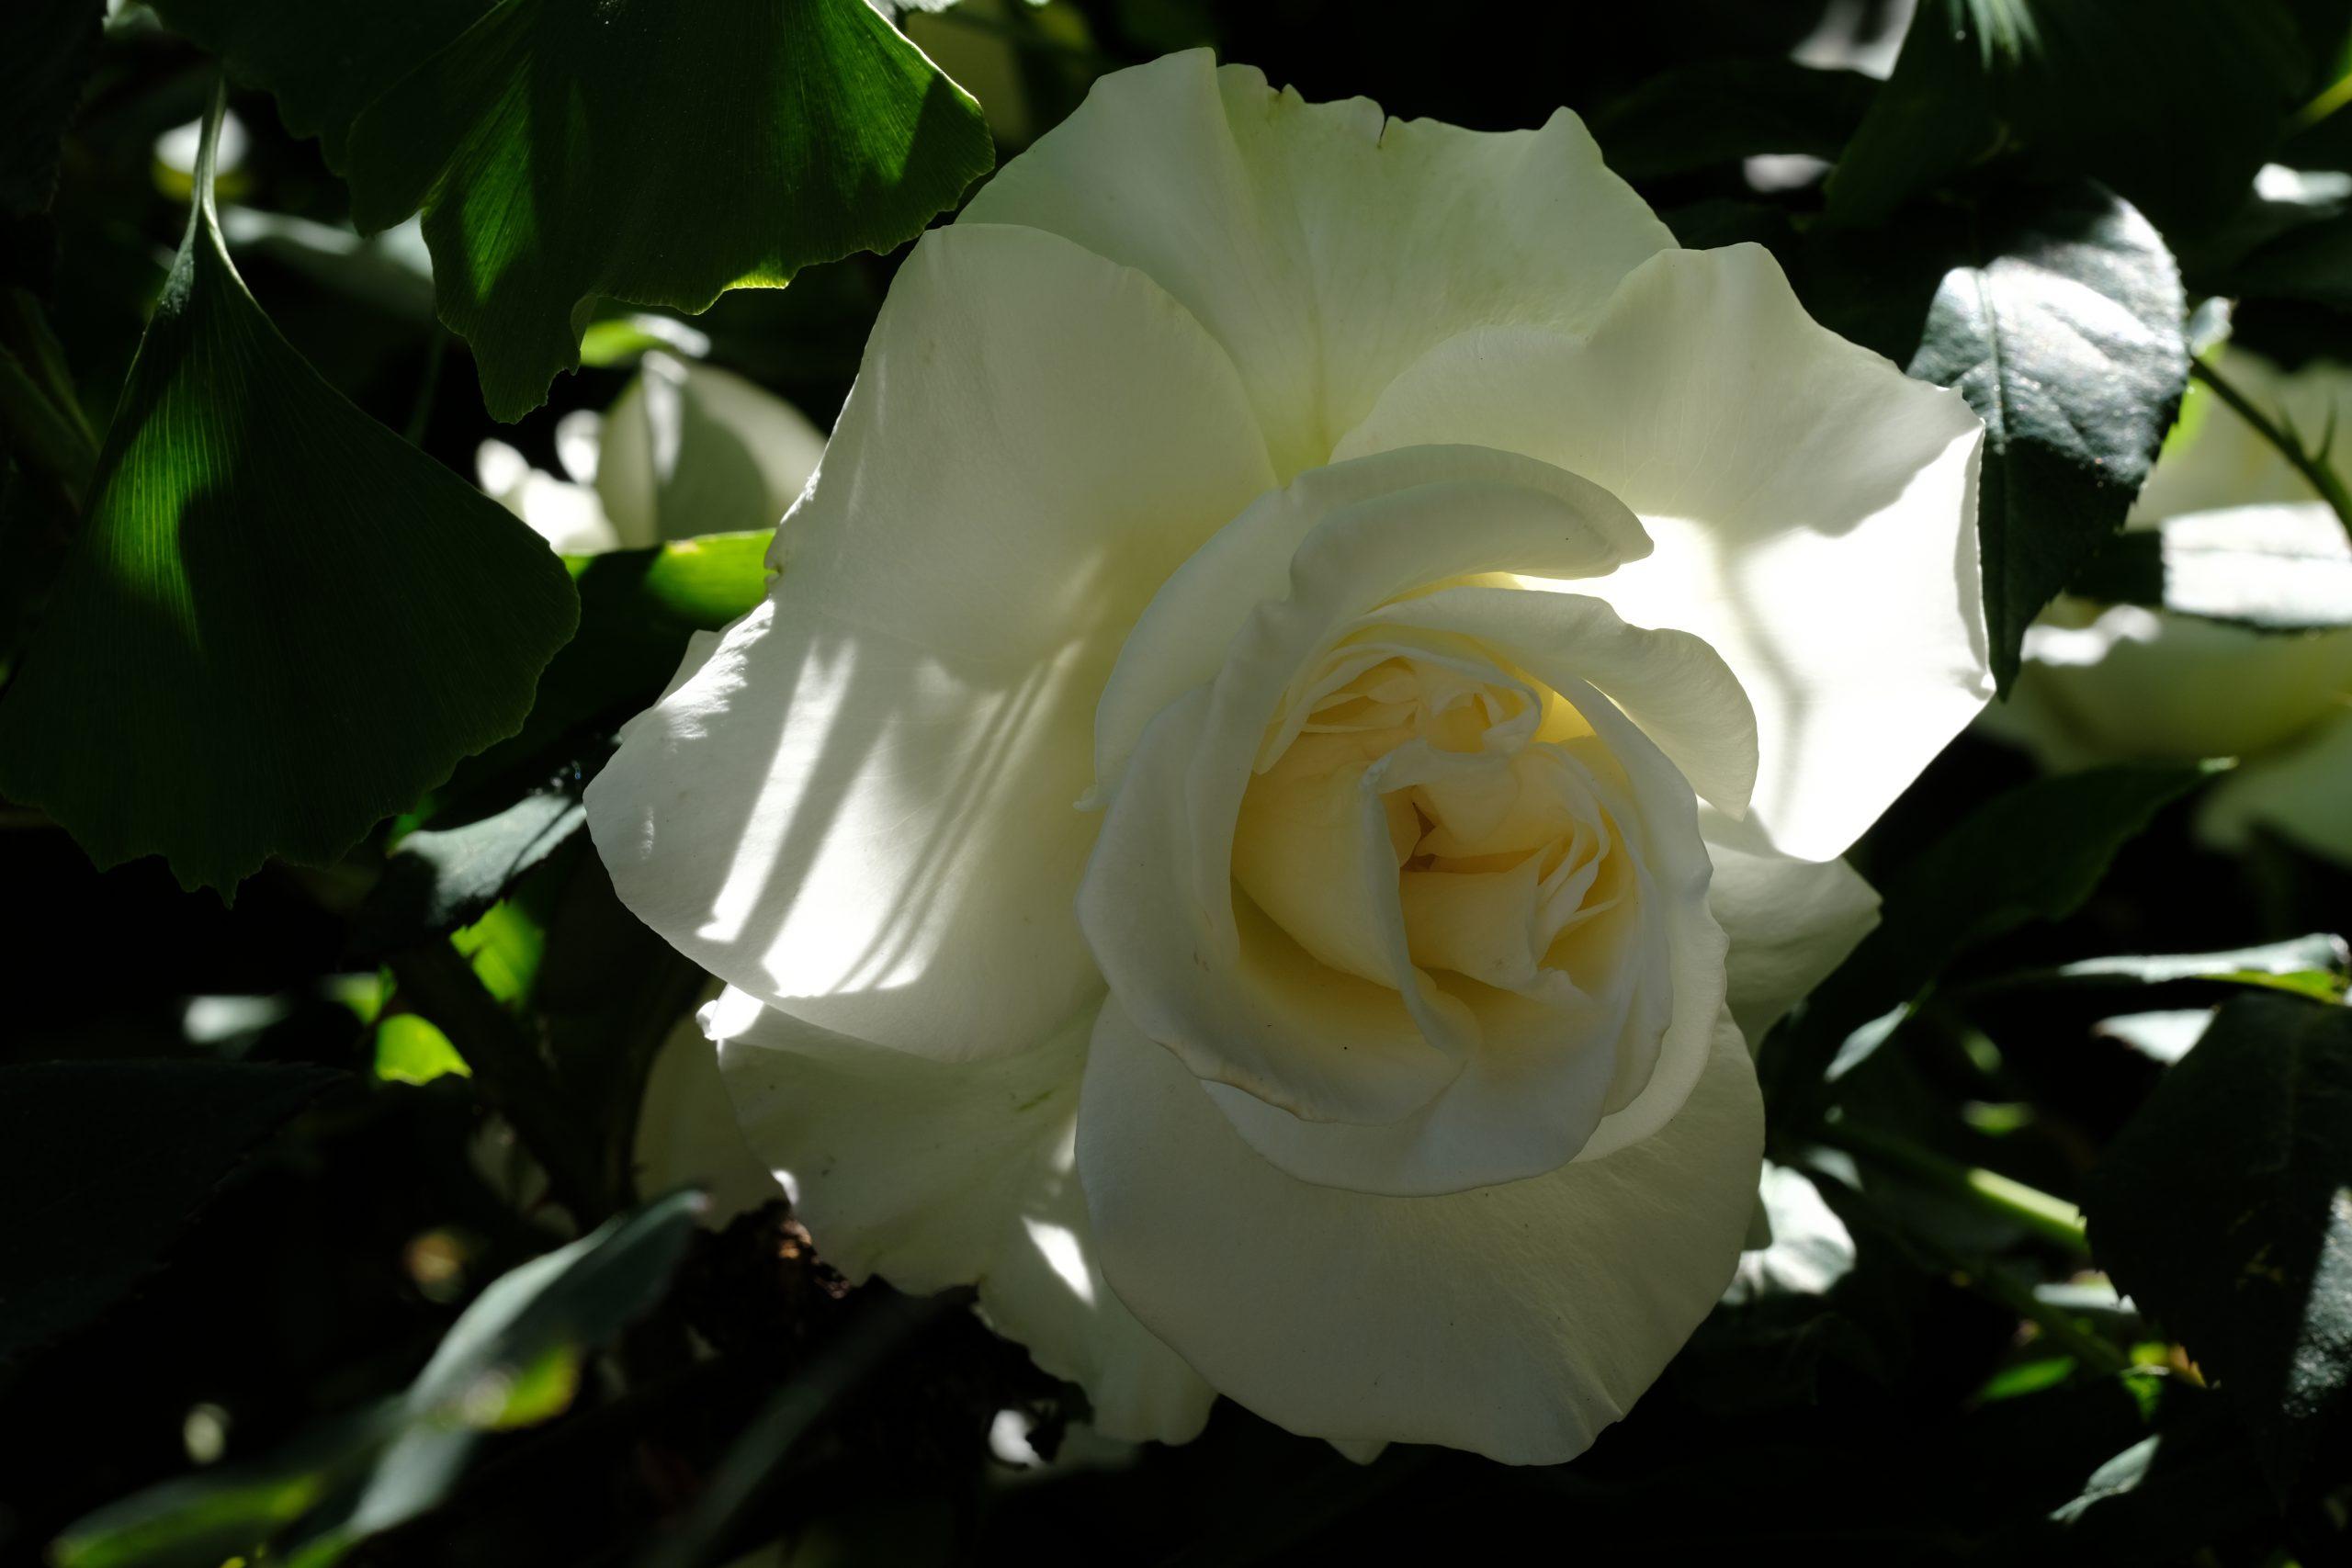 White Rose Oregon 16 May 2021 Copyright by Steve J Davis